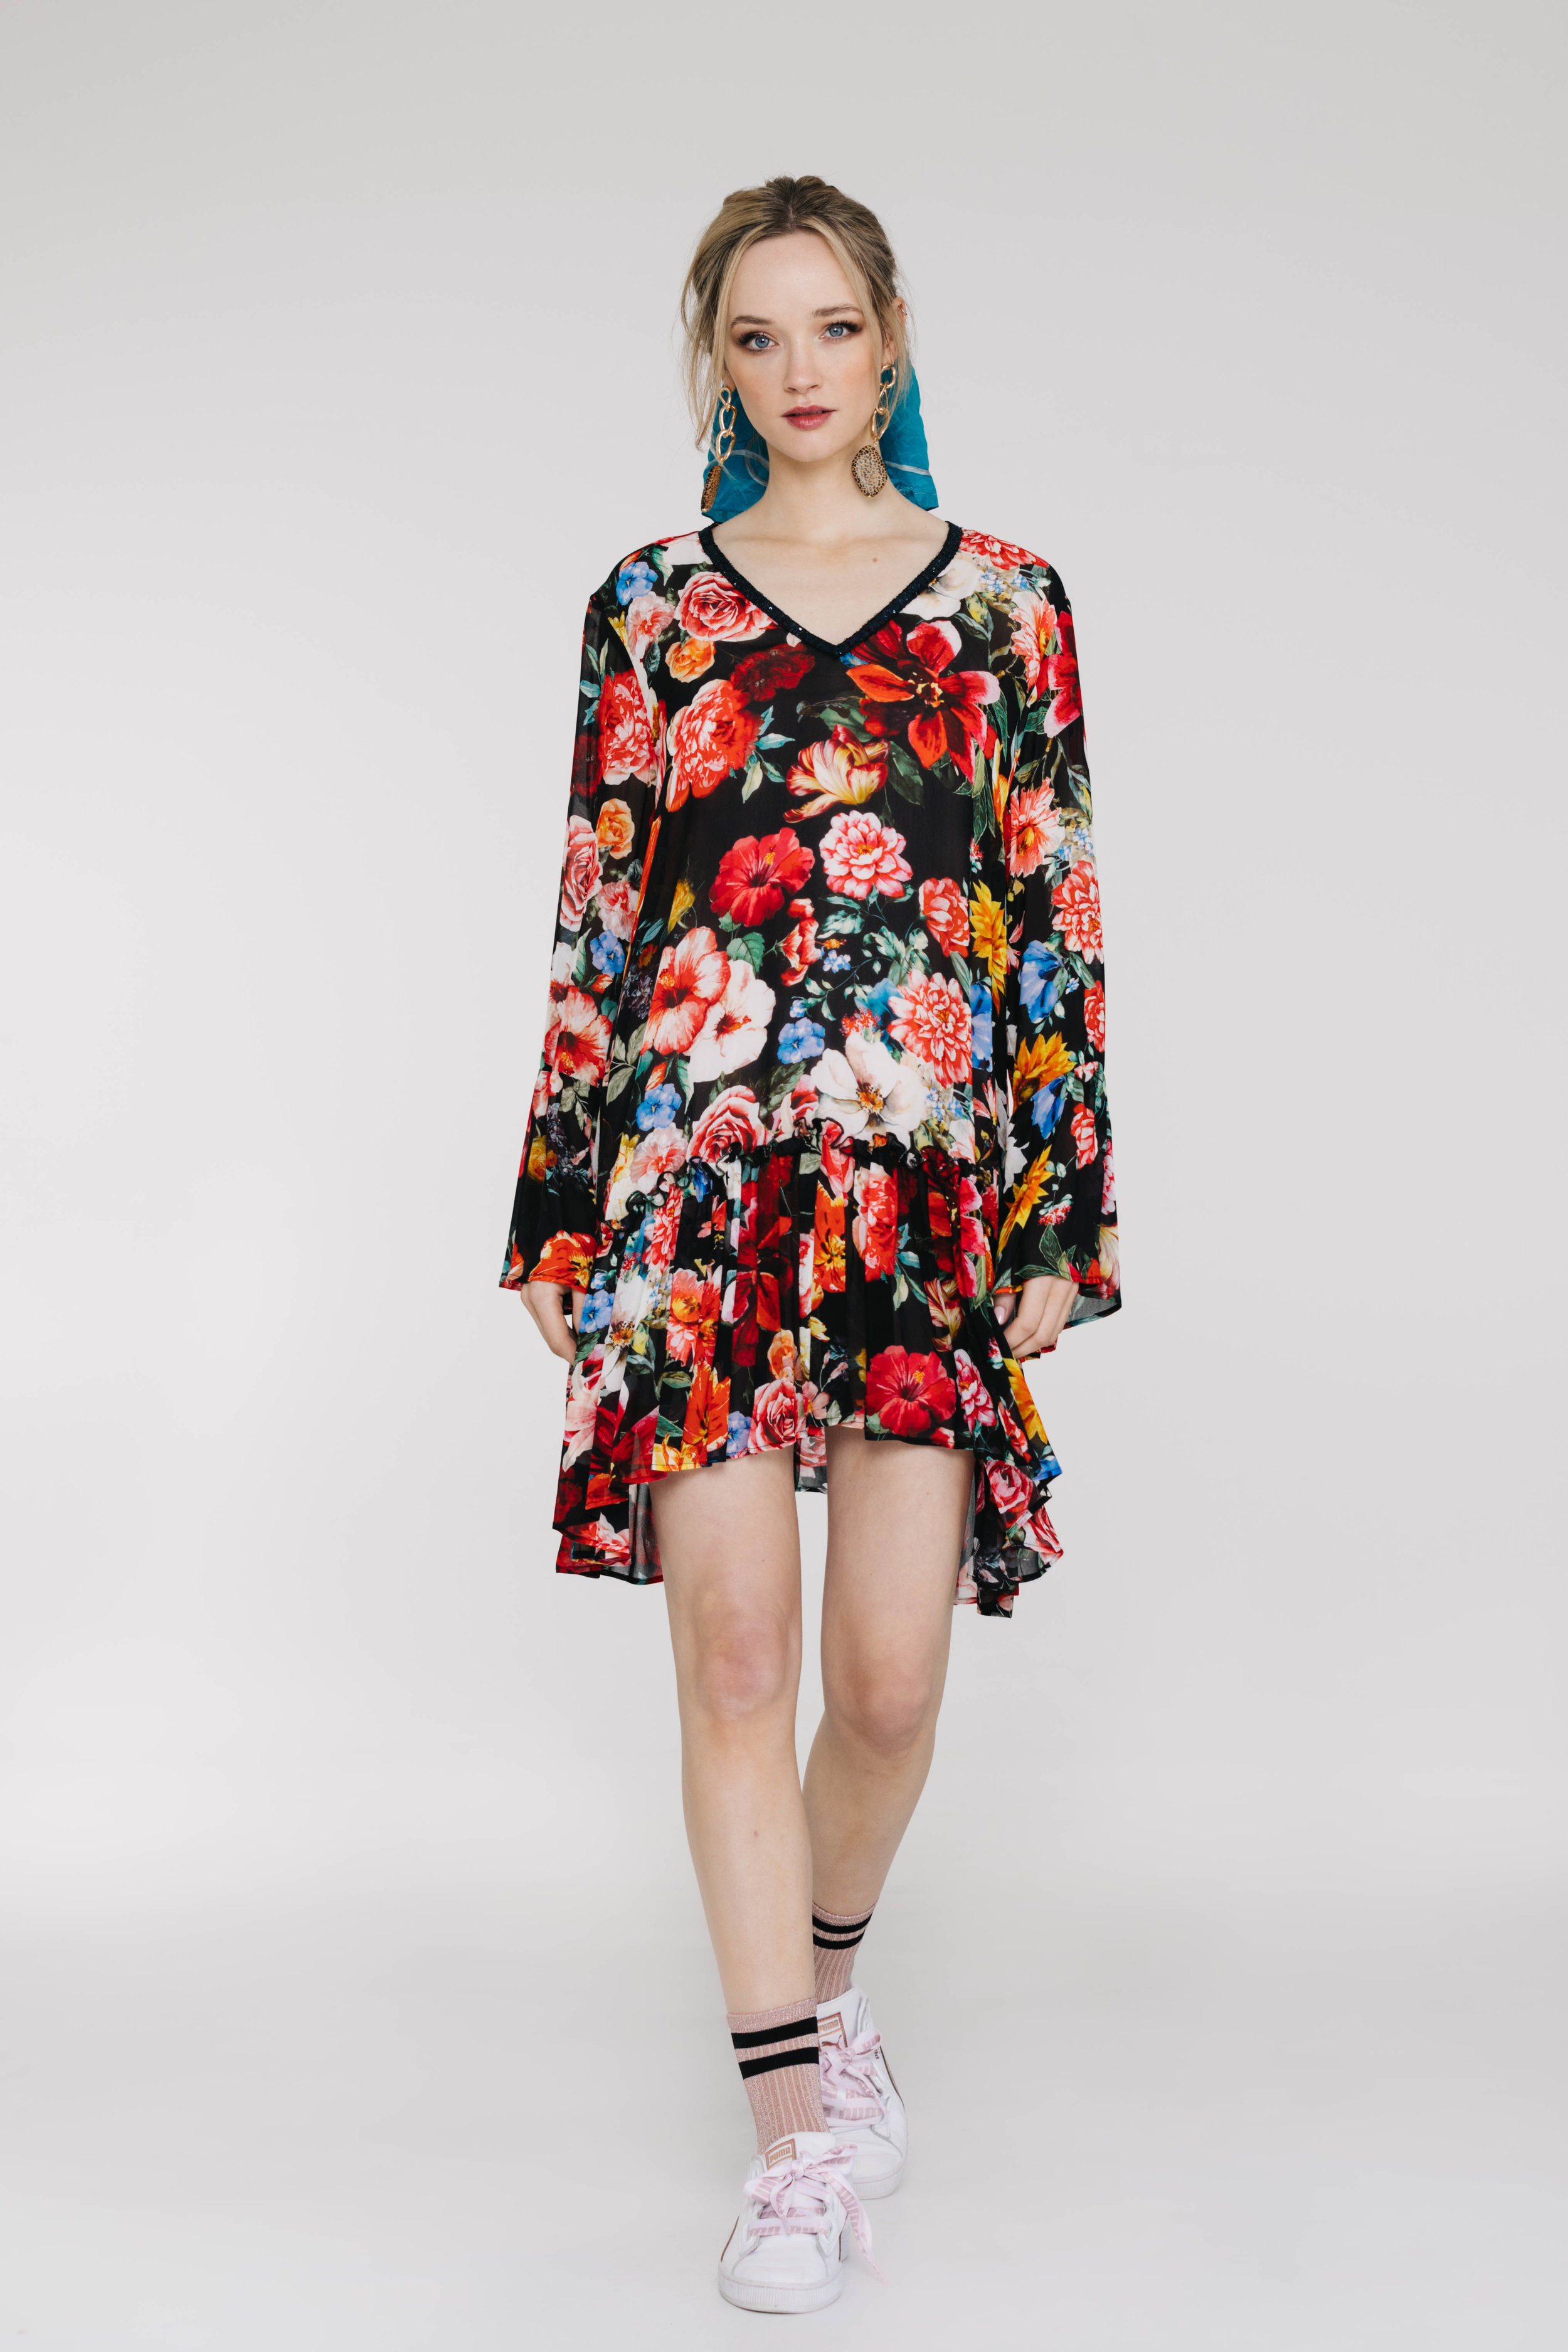 Ruff All Dress 6143N Juliet